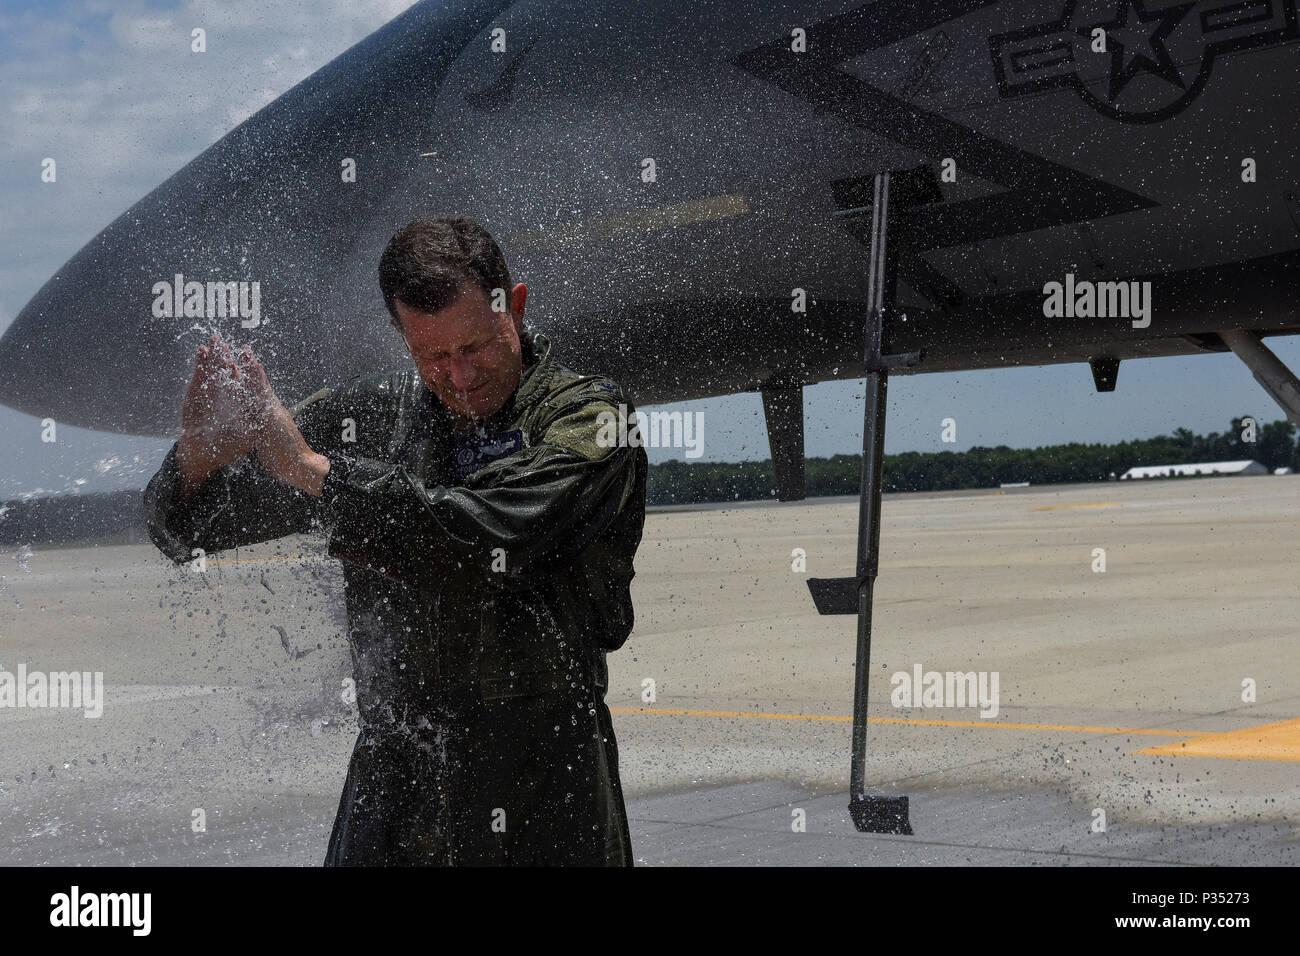 U S Air Force Member From Stockfotos & U S Air Force Member From ...